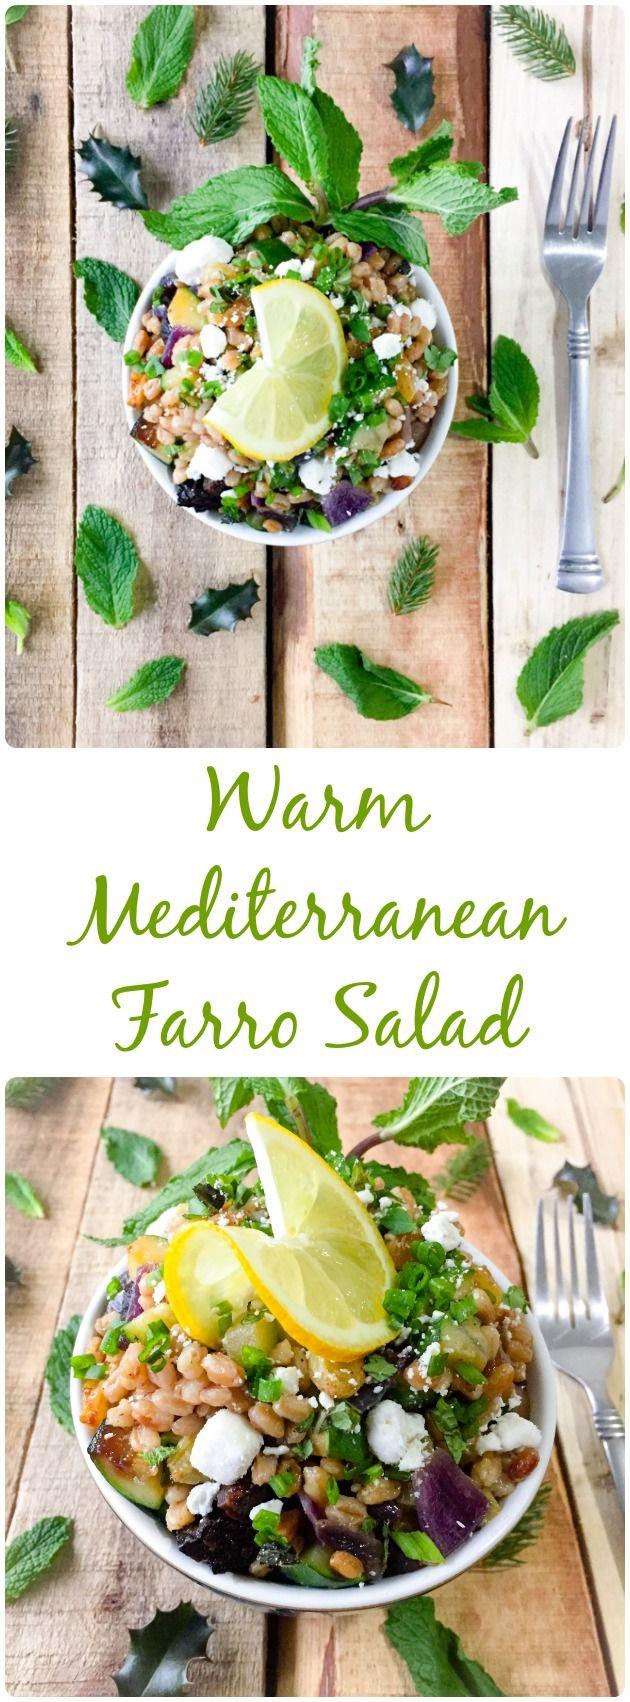 Warm Mediterranean Farro Salad! Quick healthy meals. Salad ideas. Pasta alternative.